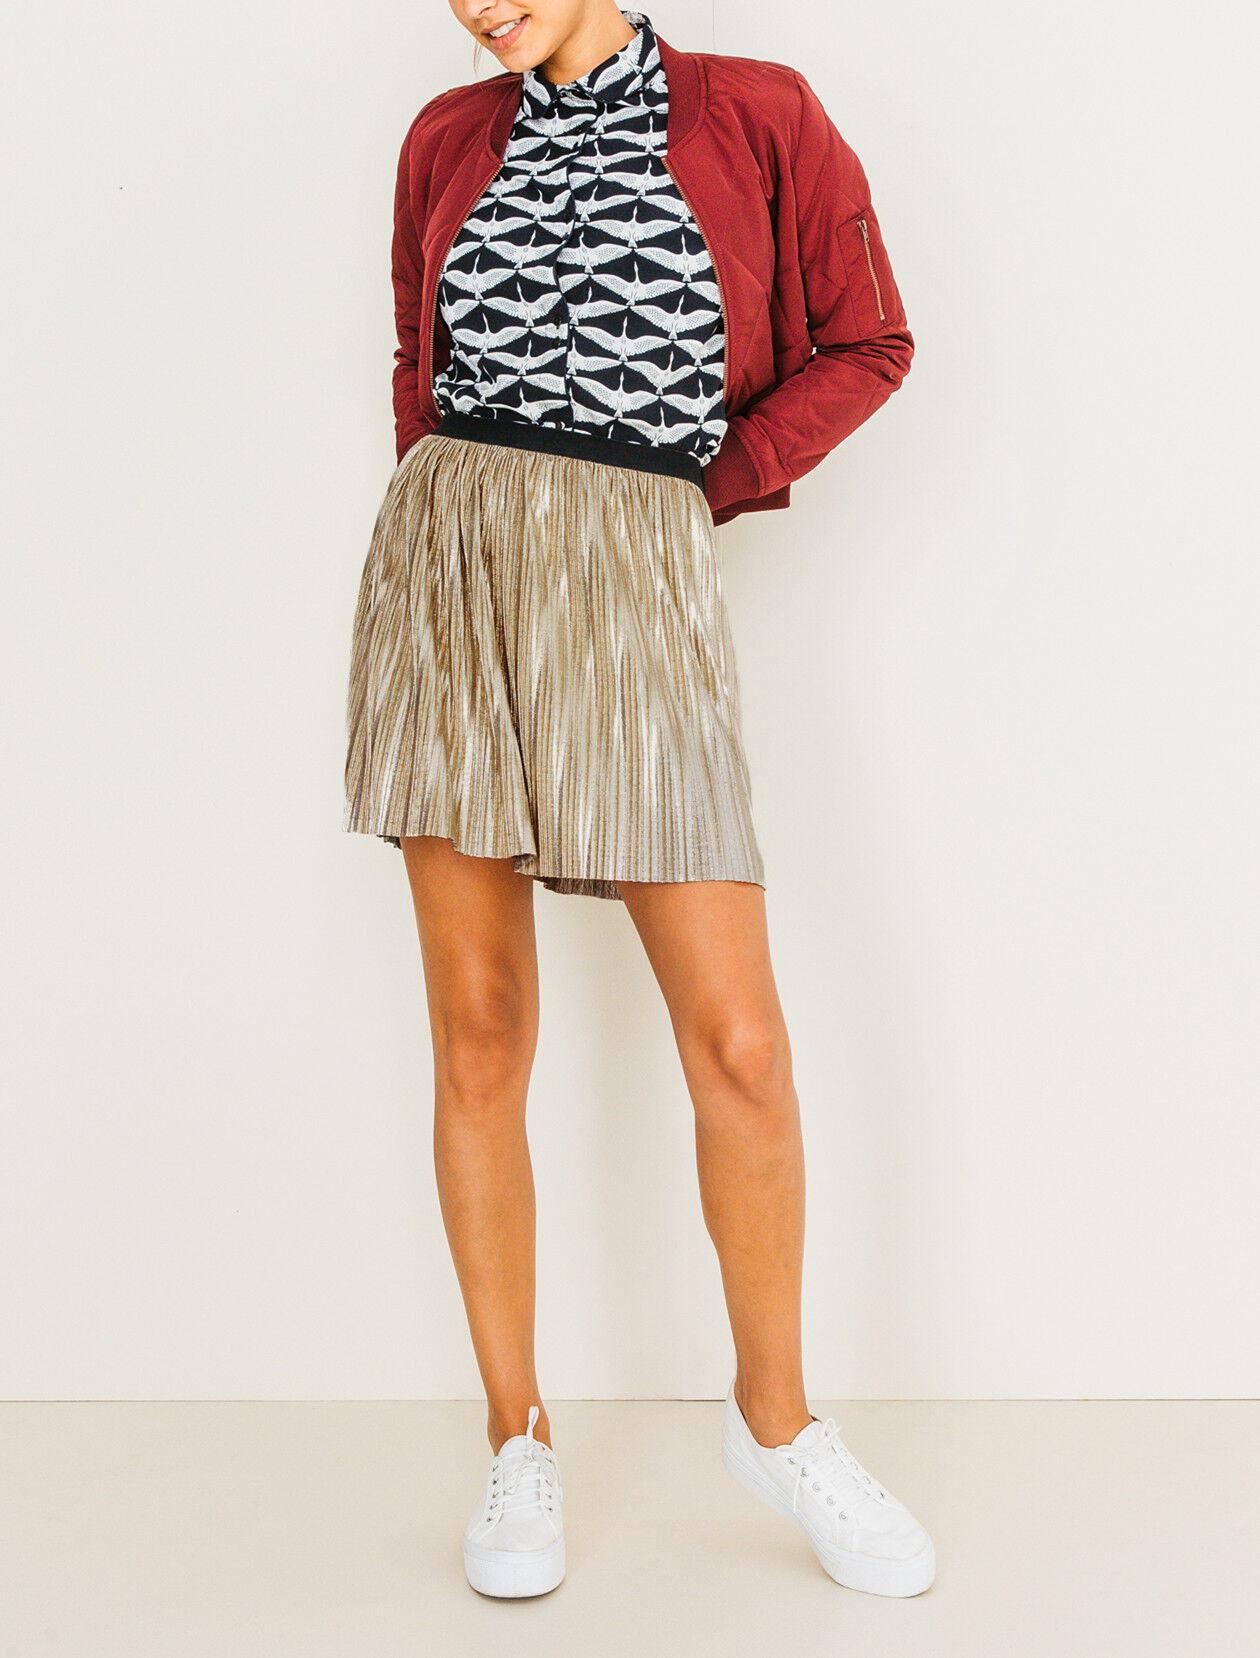 courte Jupe plissée plissée femmeBizzbee Jupe métallisée métallisée courte femmeBizzbee b76gmfyIvY